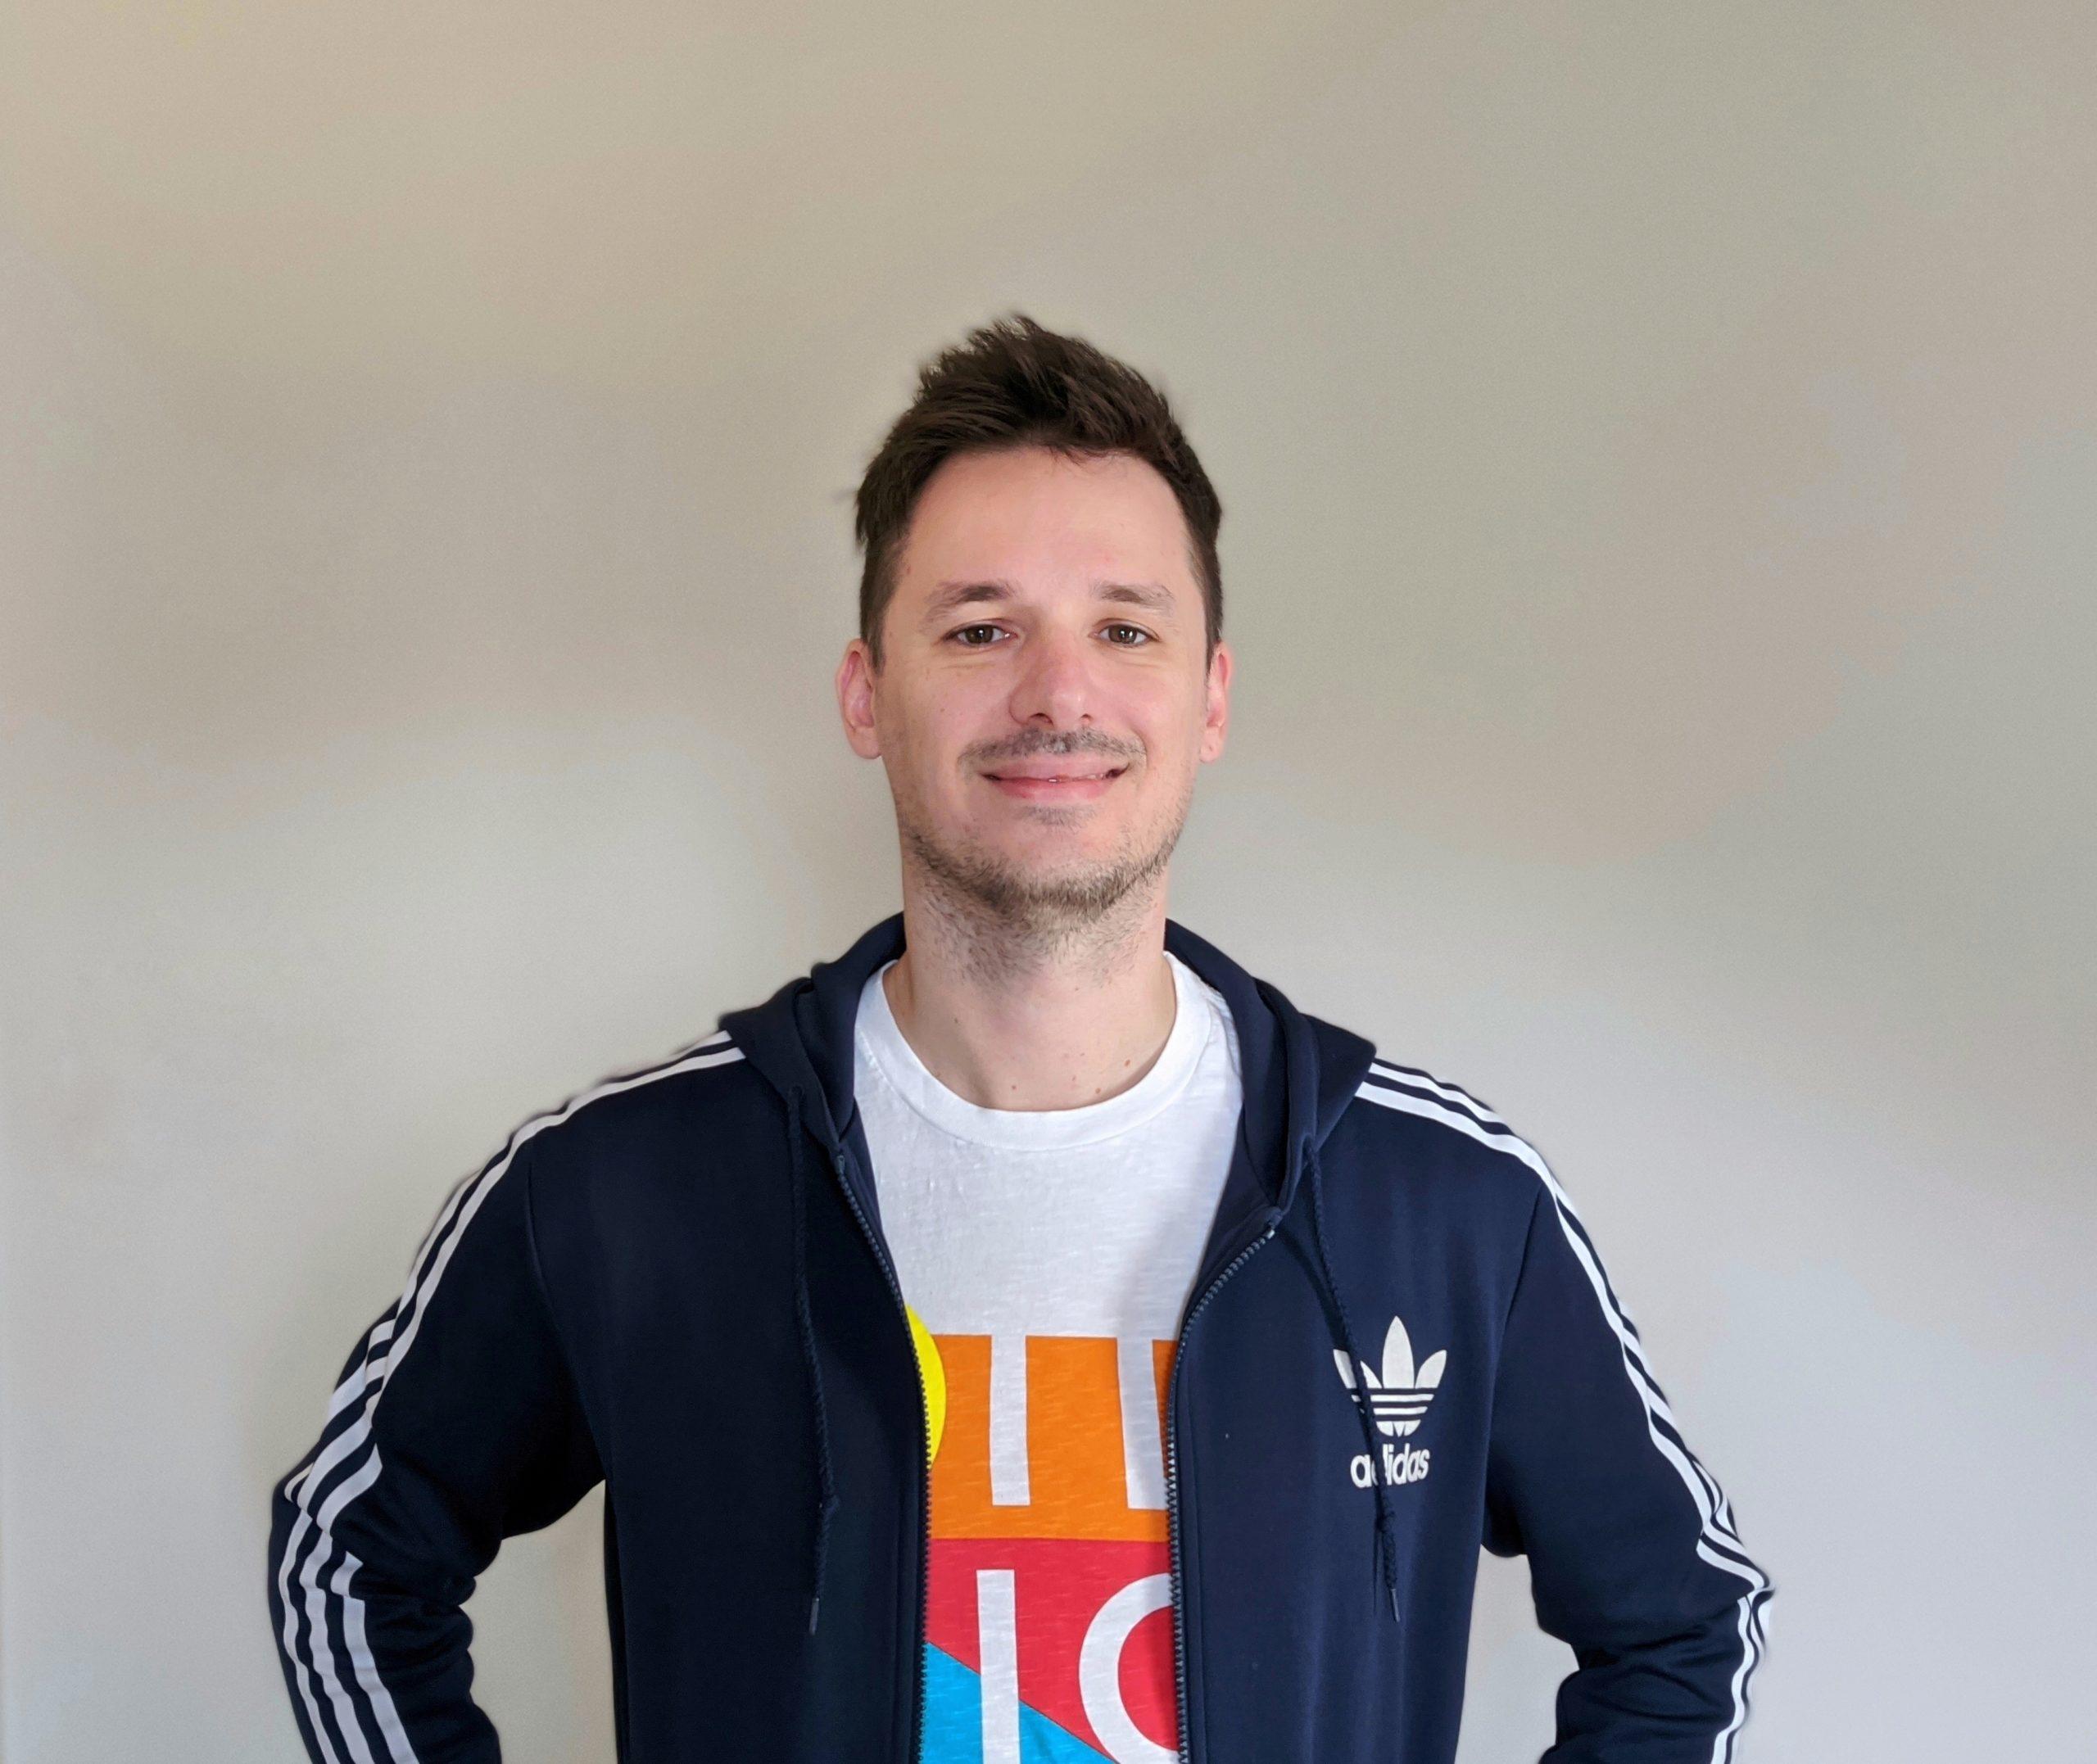 Pavle Ivetic on SerbianTech podcast